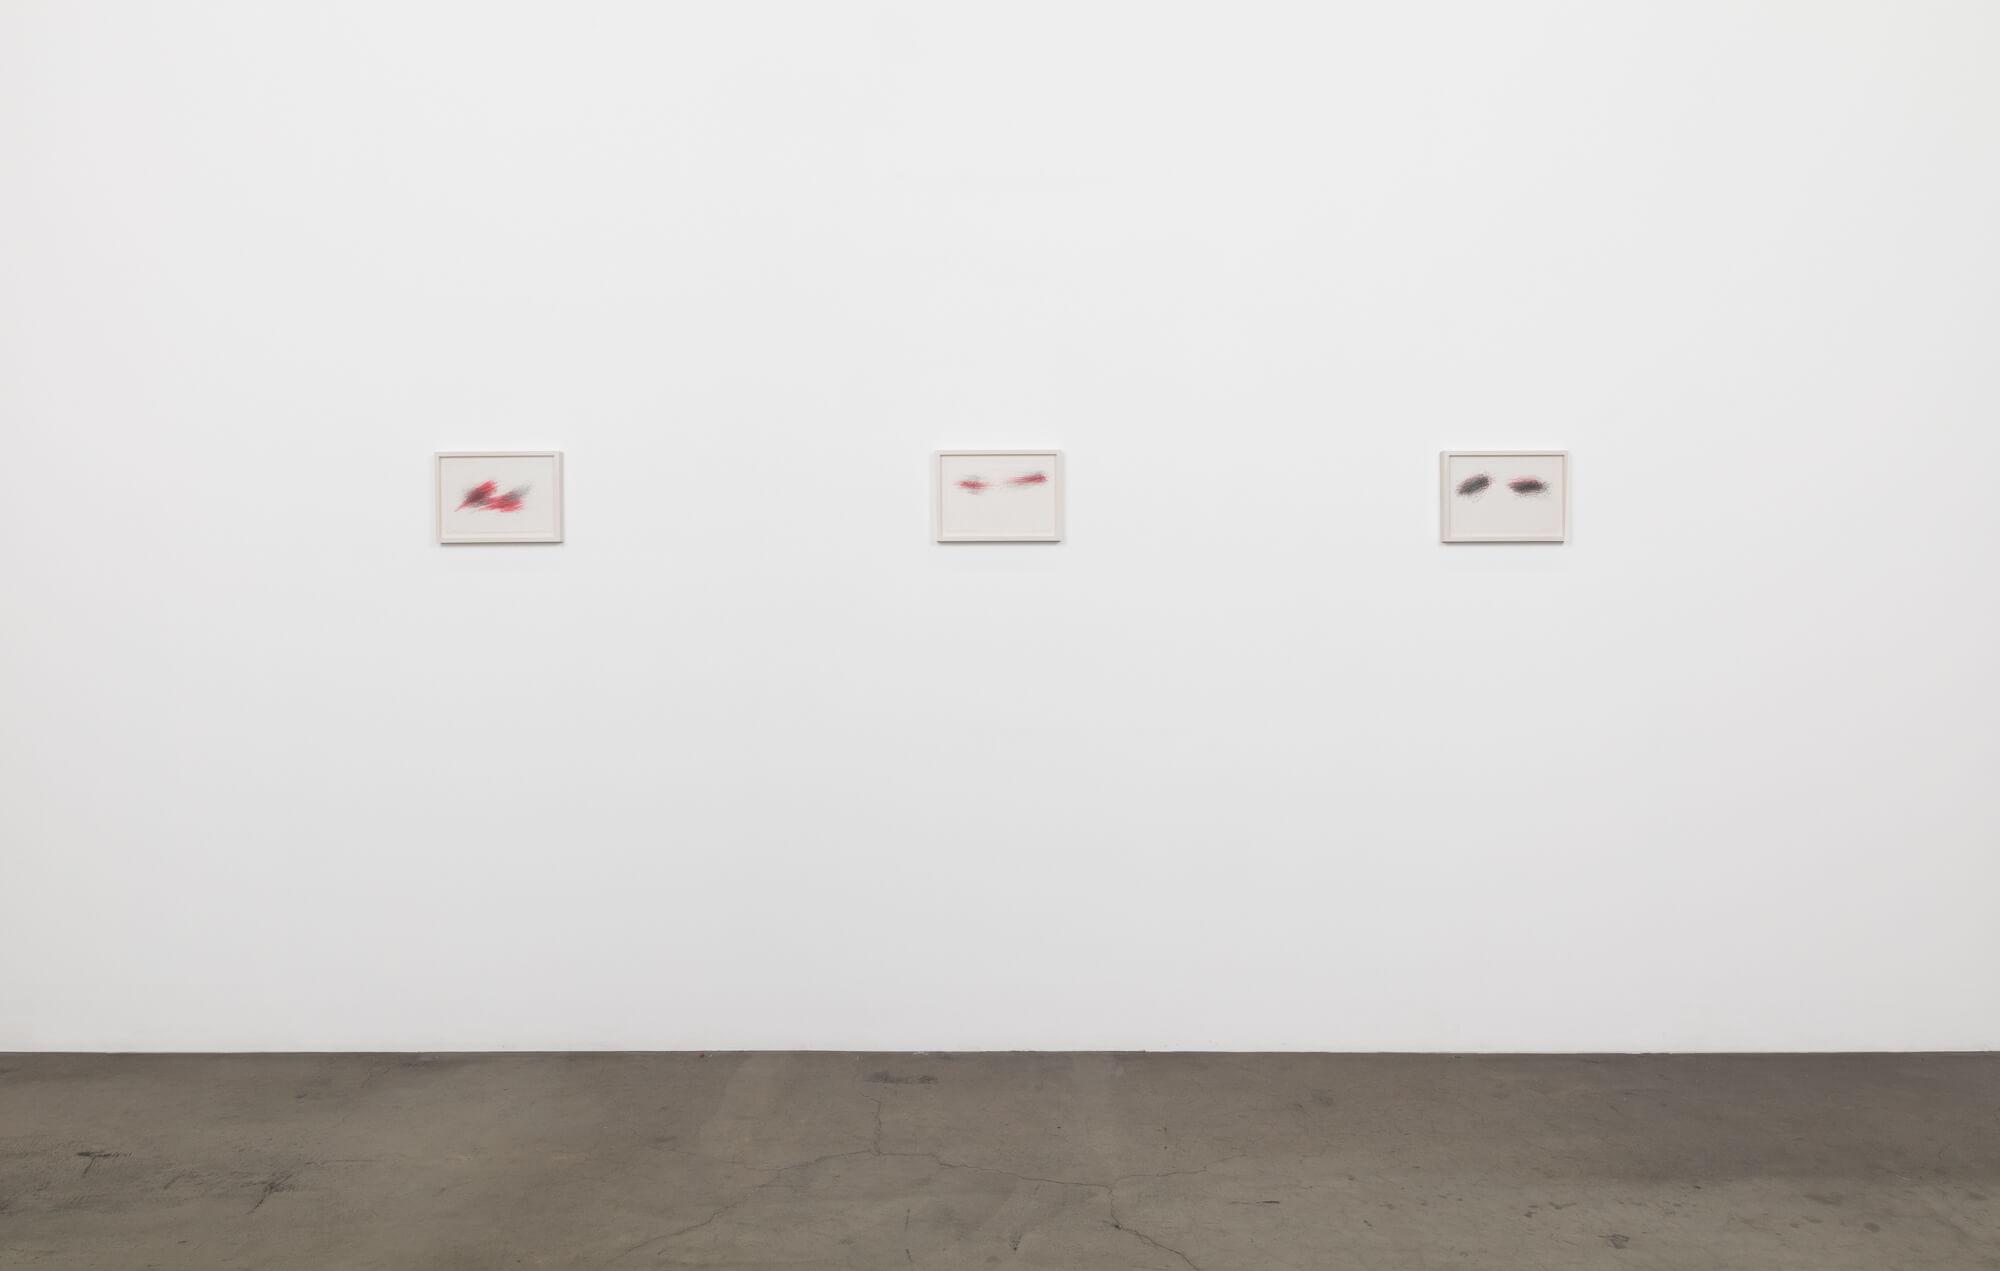 6_William Anastasi, installation view, Ghebaly Gallery